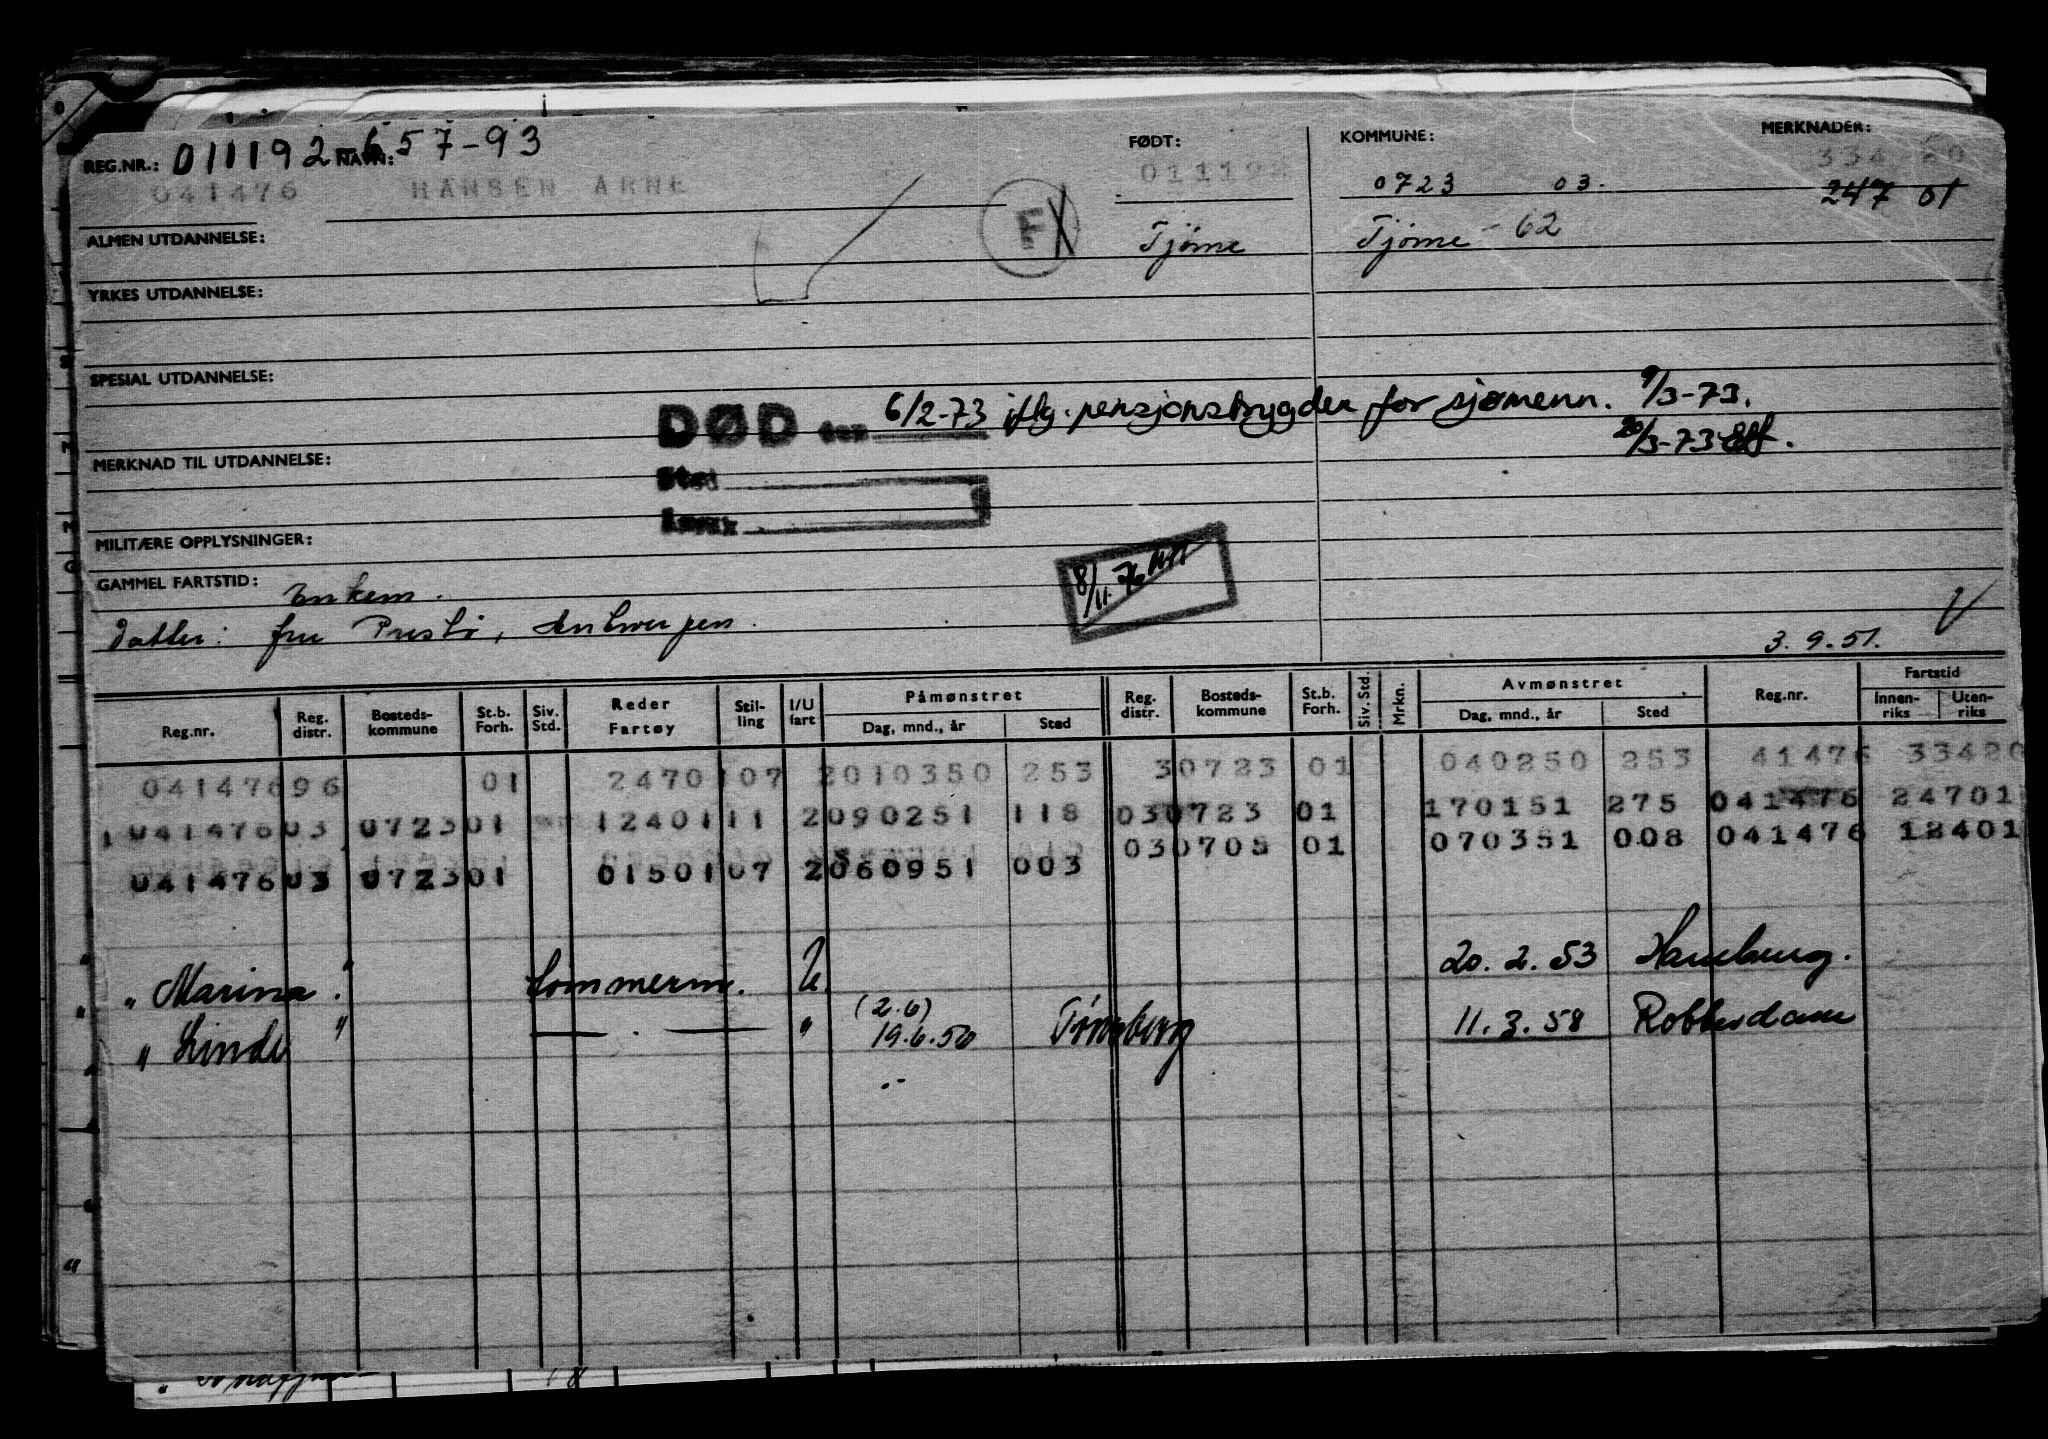 RA, Direktoratet for sjømenn, G/Gb/L0012: Hovedkort, 1892-1893, s. 239